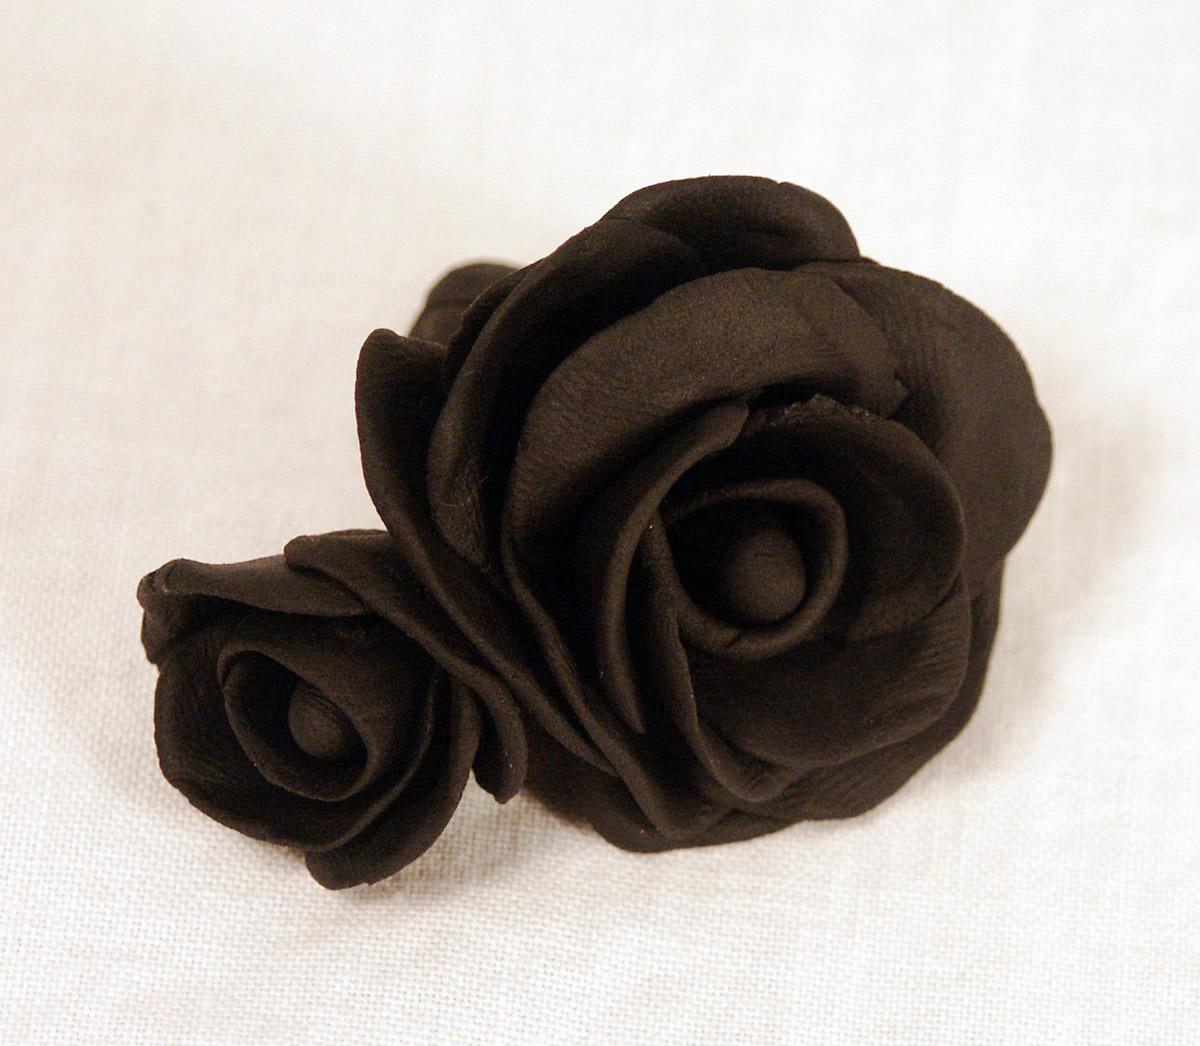 Black Rose | Texas Rose Bakery